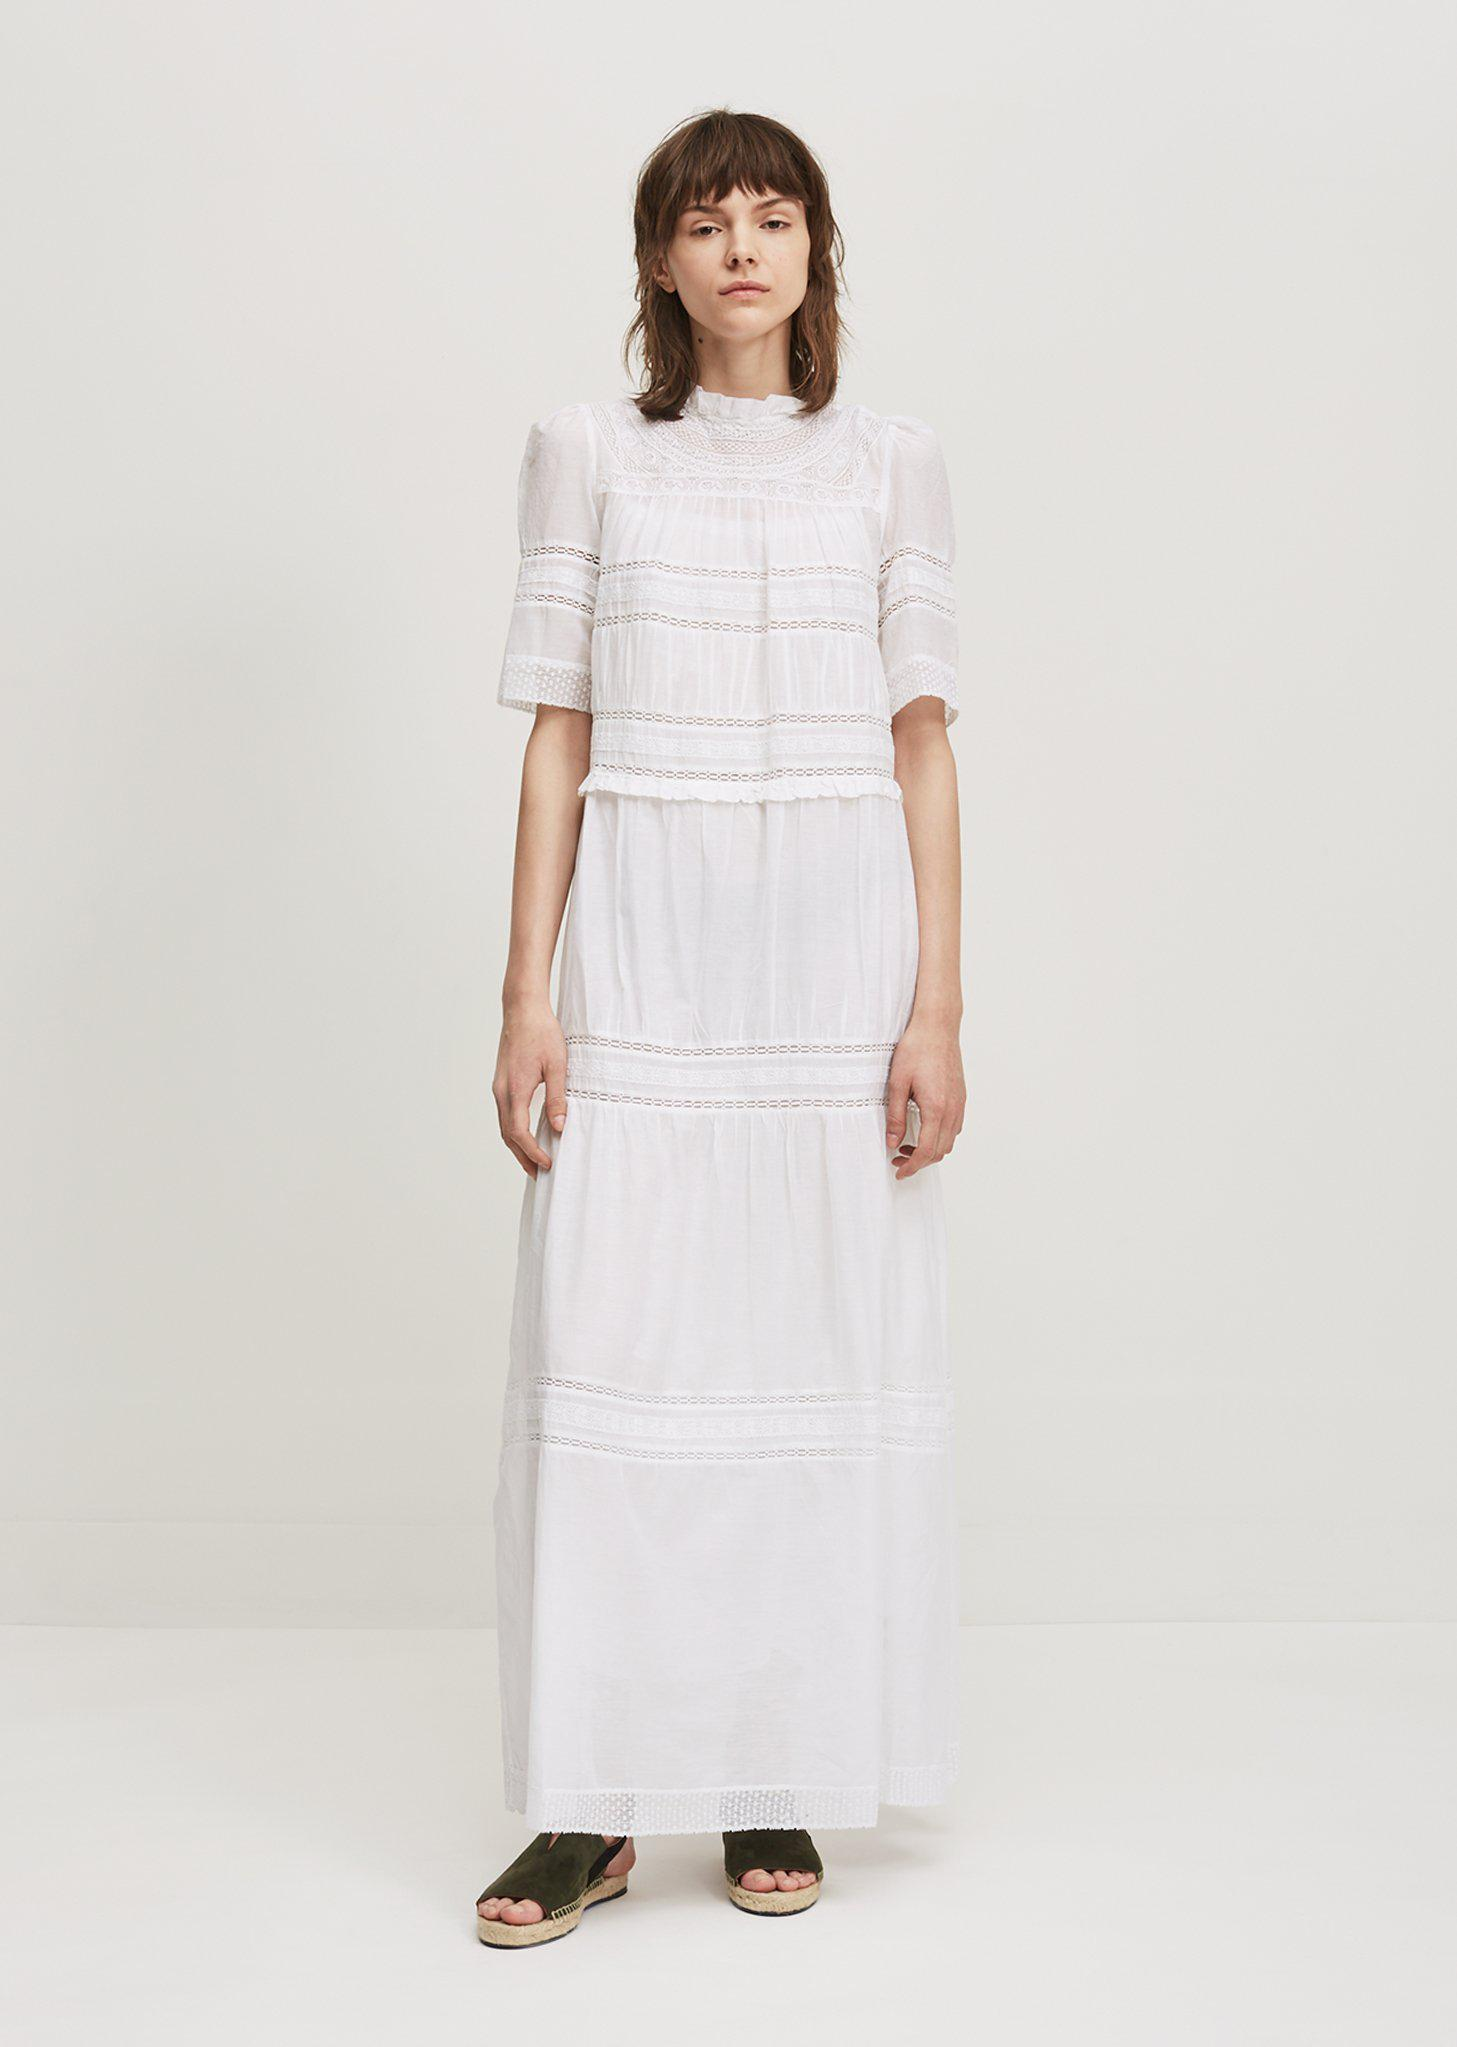 Vealy cotton-blend dress Isabel Marant Ut6nPRHCMK